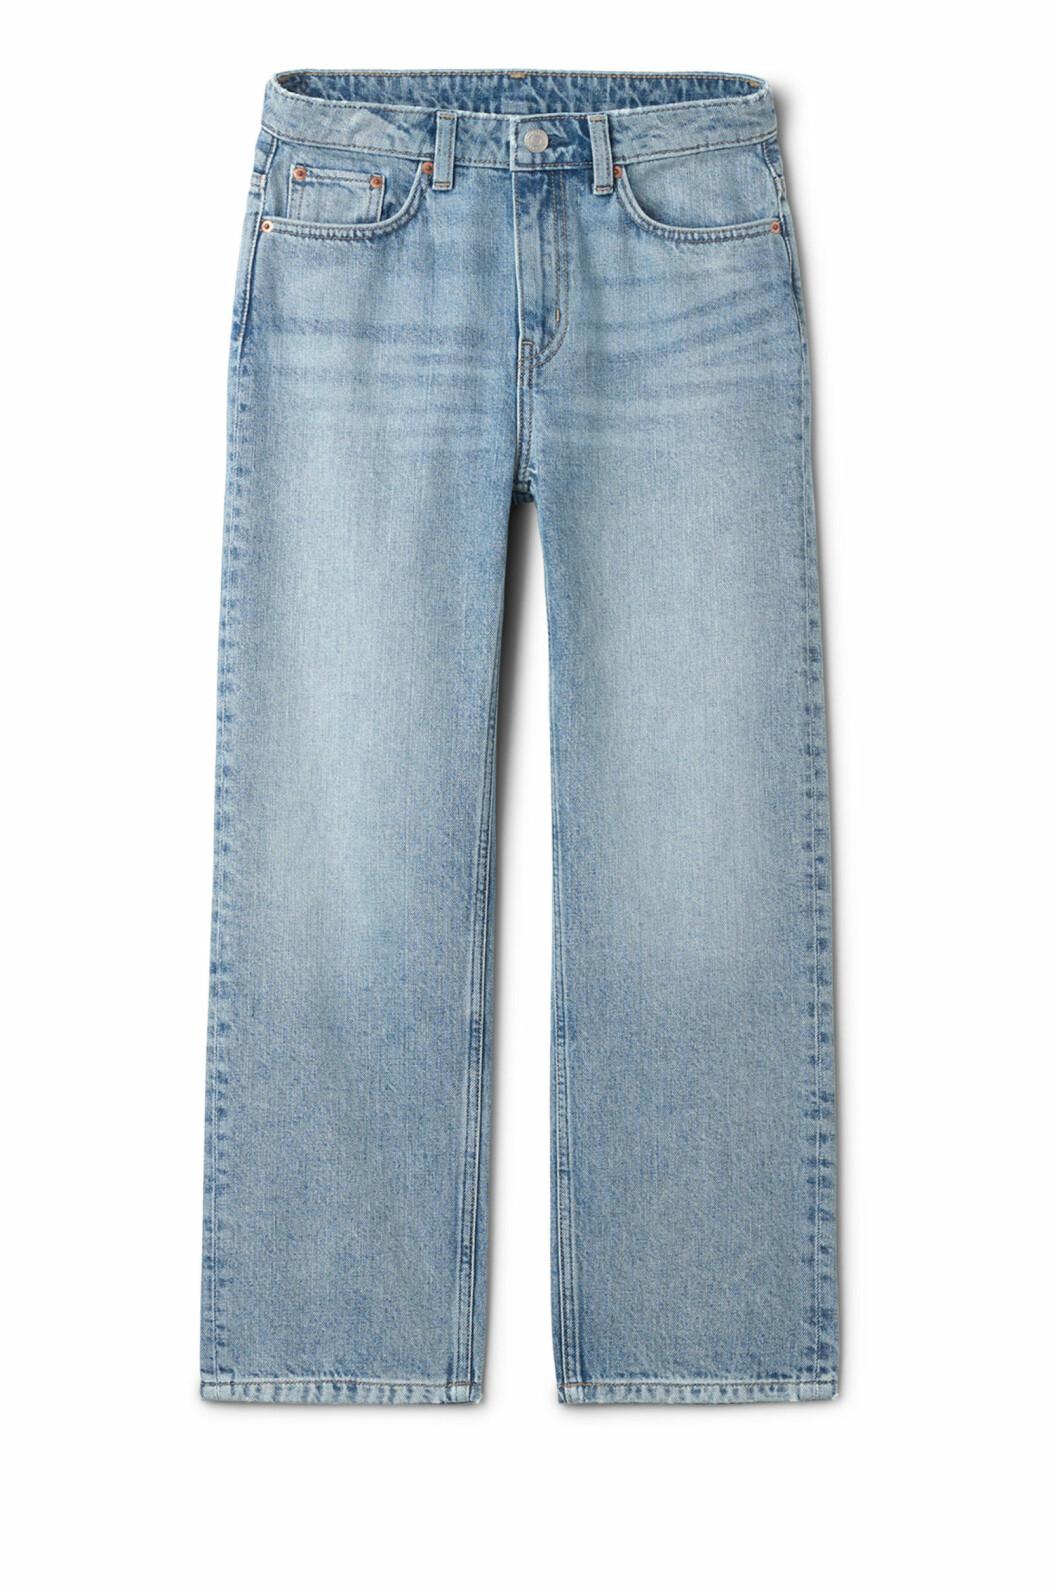 <strong>Jeans fra Weekday |500,-| https:</strong>//www.weekday.com/en_sek/women/categories/jeans/product.voyage-wow-blue-jeans-blue.0444045001.html